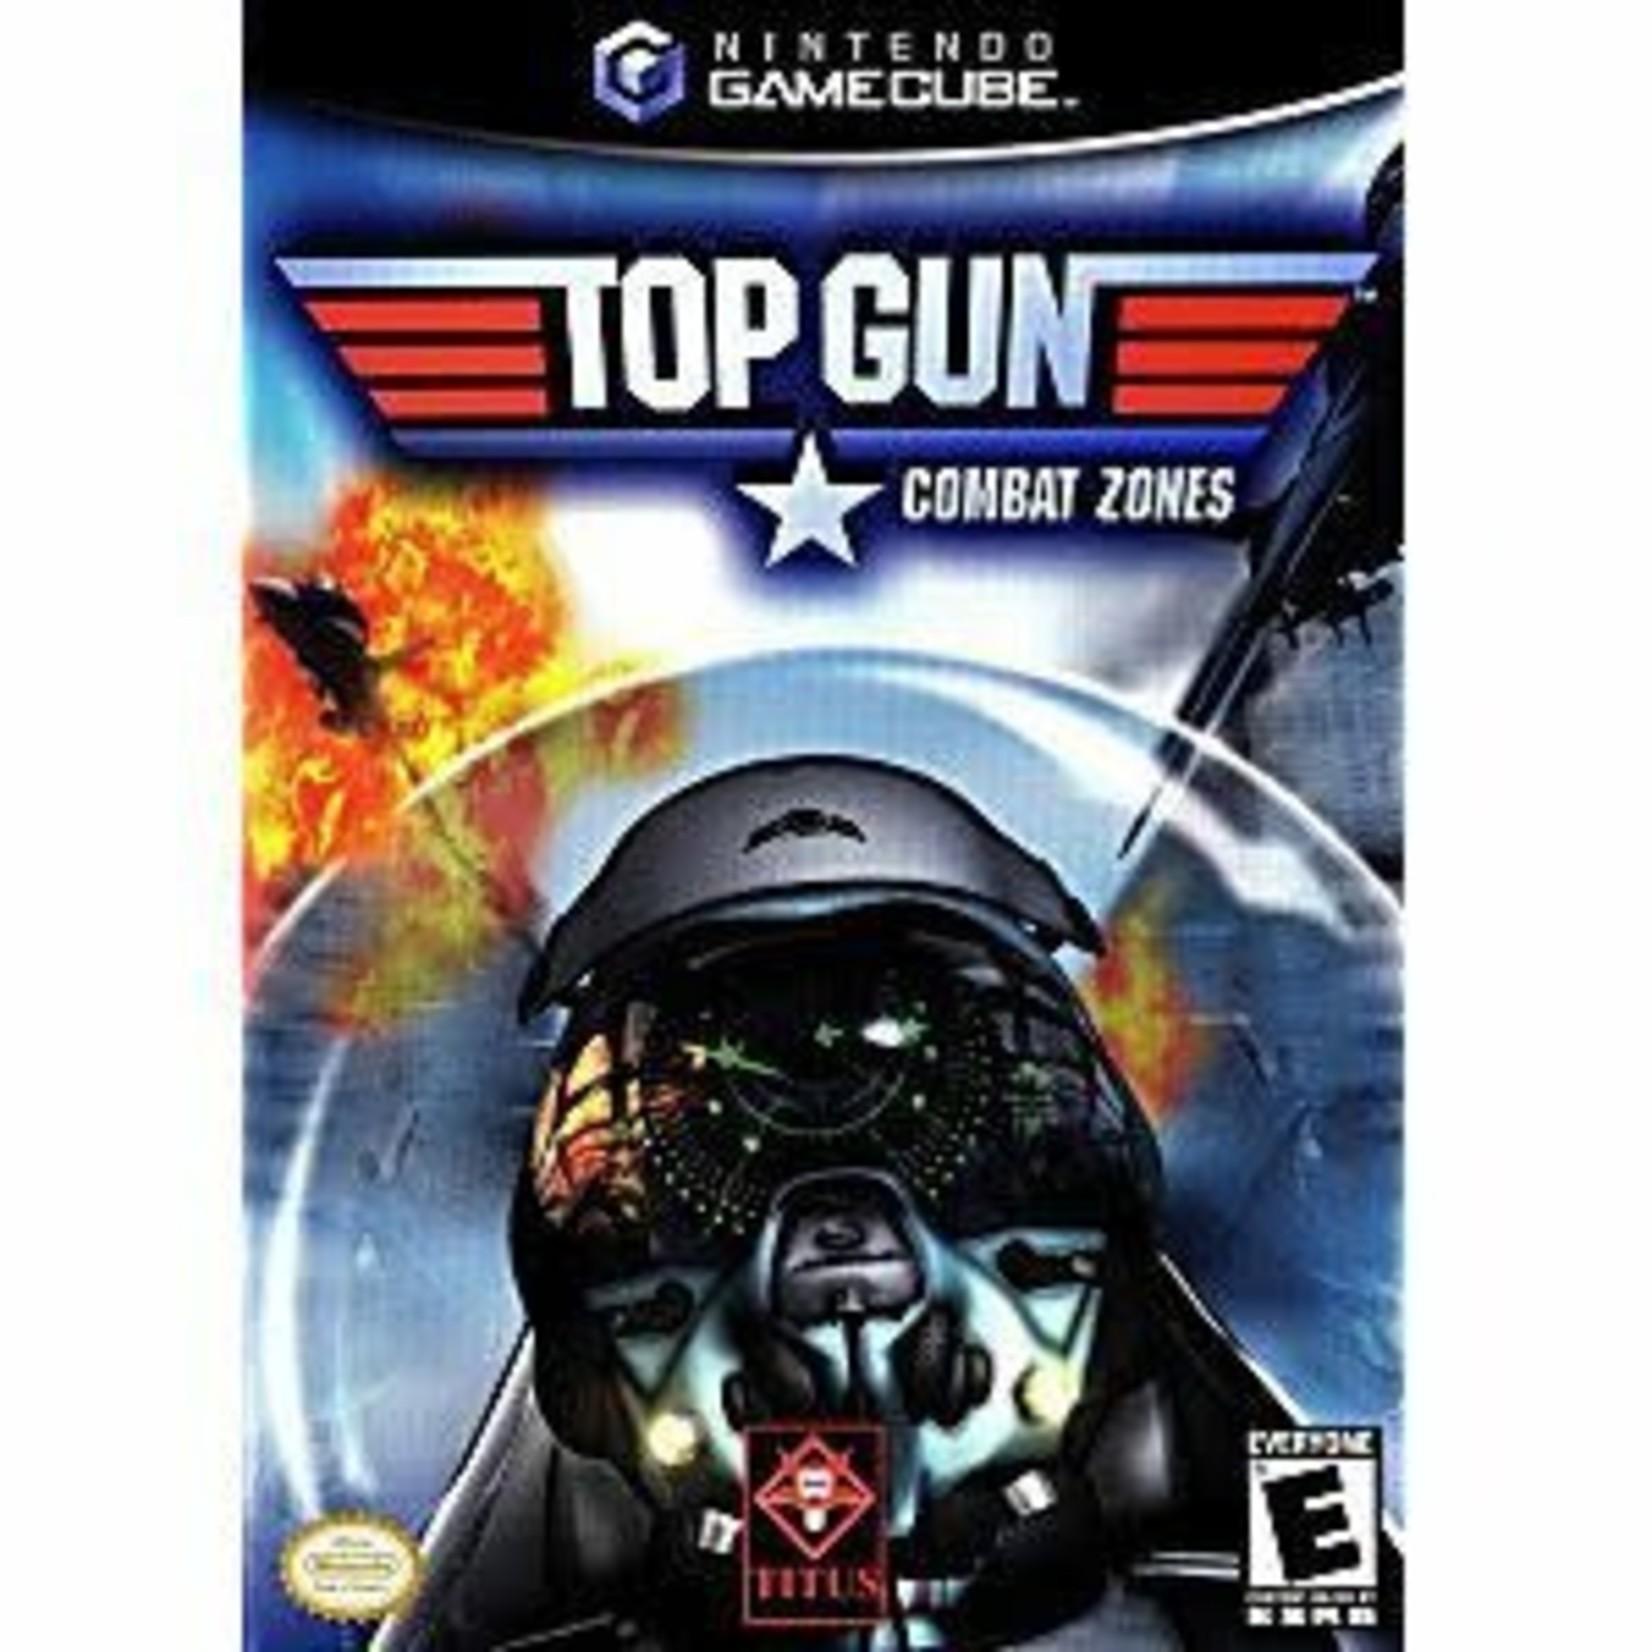 GCU-TOP GUN COMBAT ZONE